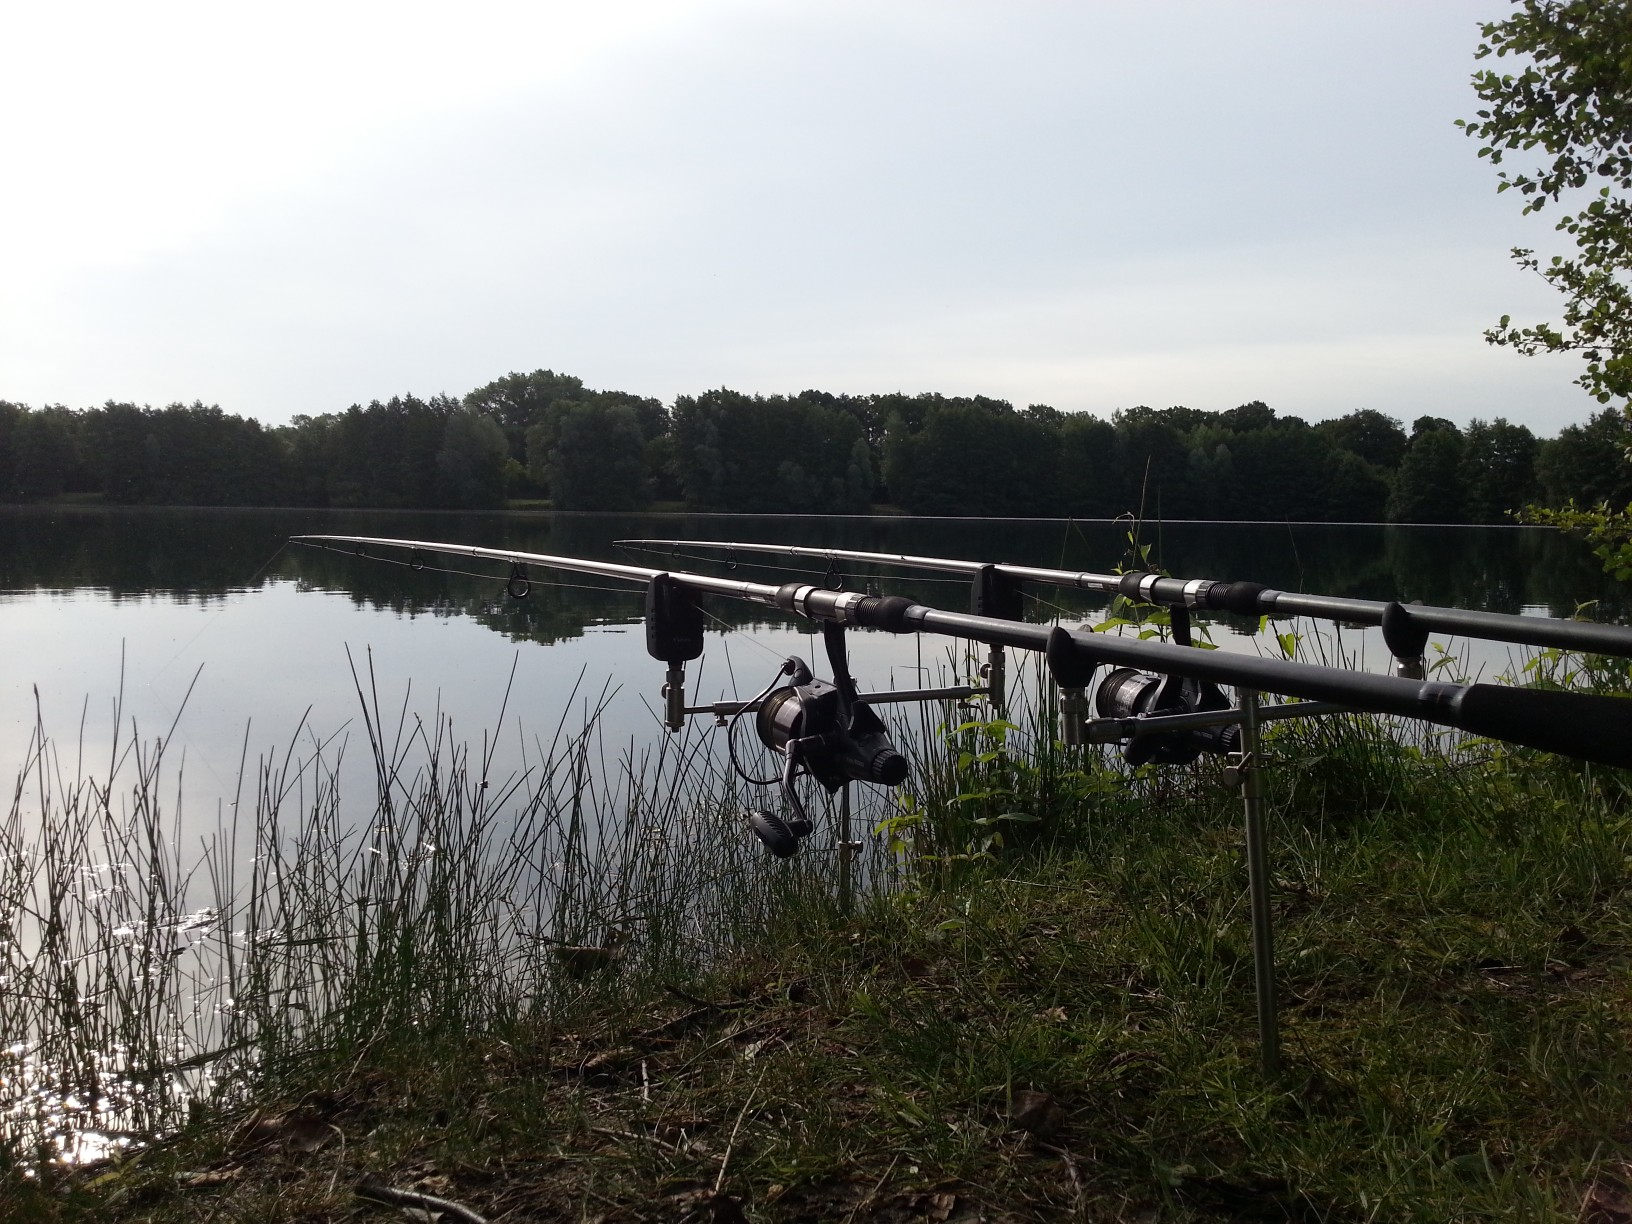 Sportfischerei-Verein Burgdorf e.V.